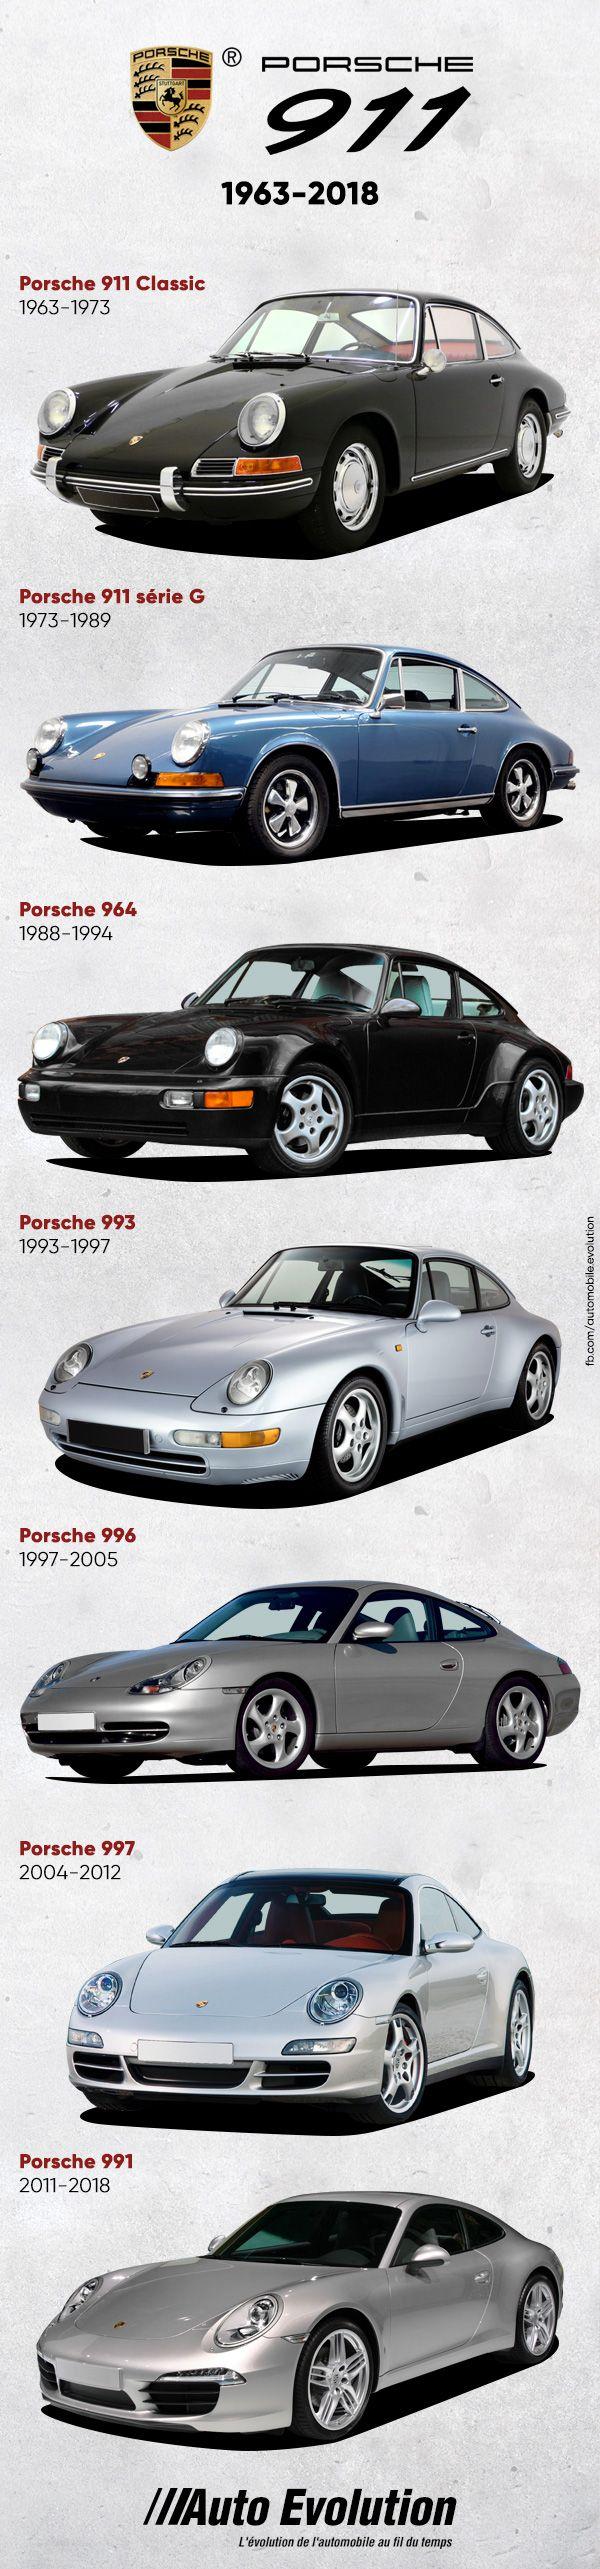 Porsche 911 evolution 911 history